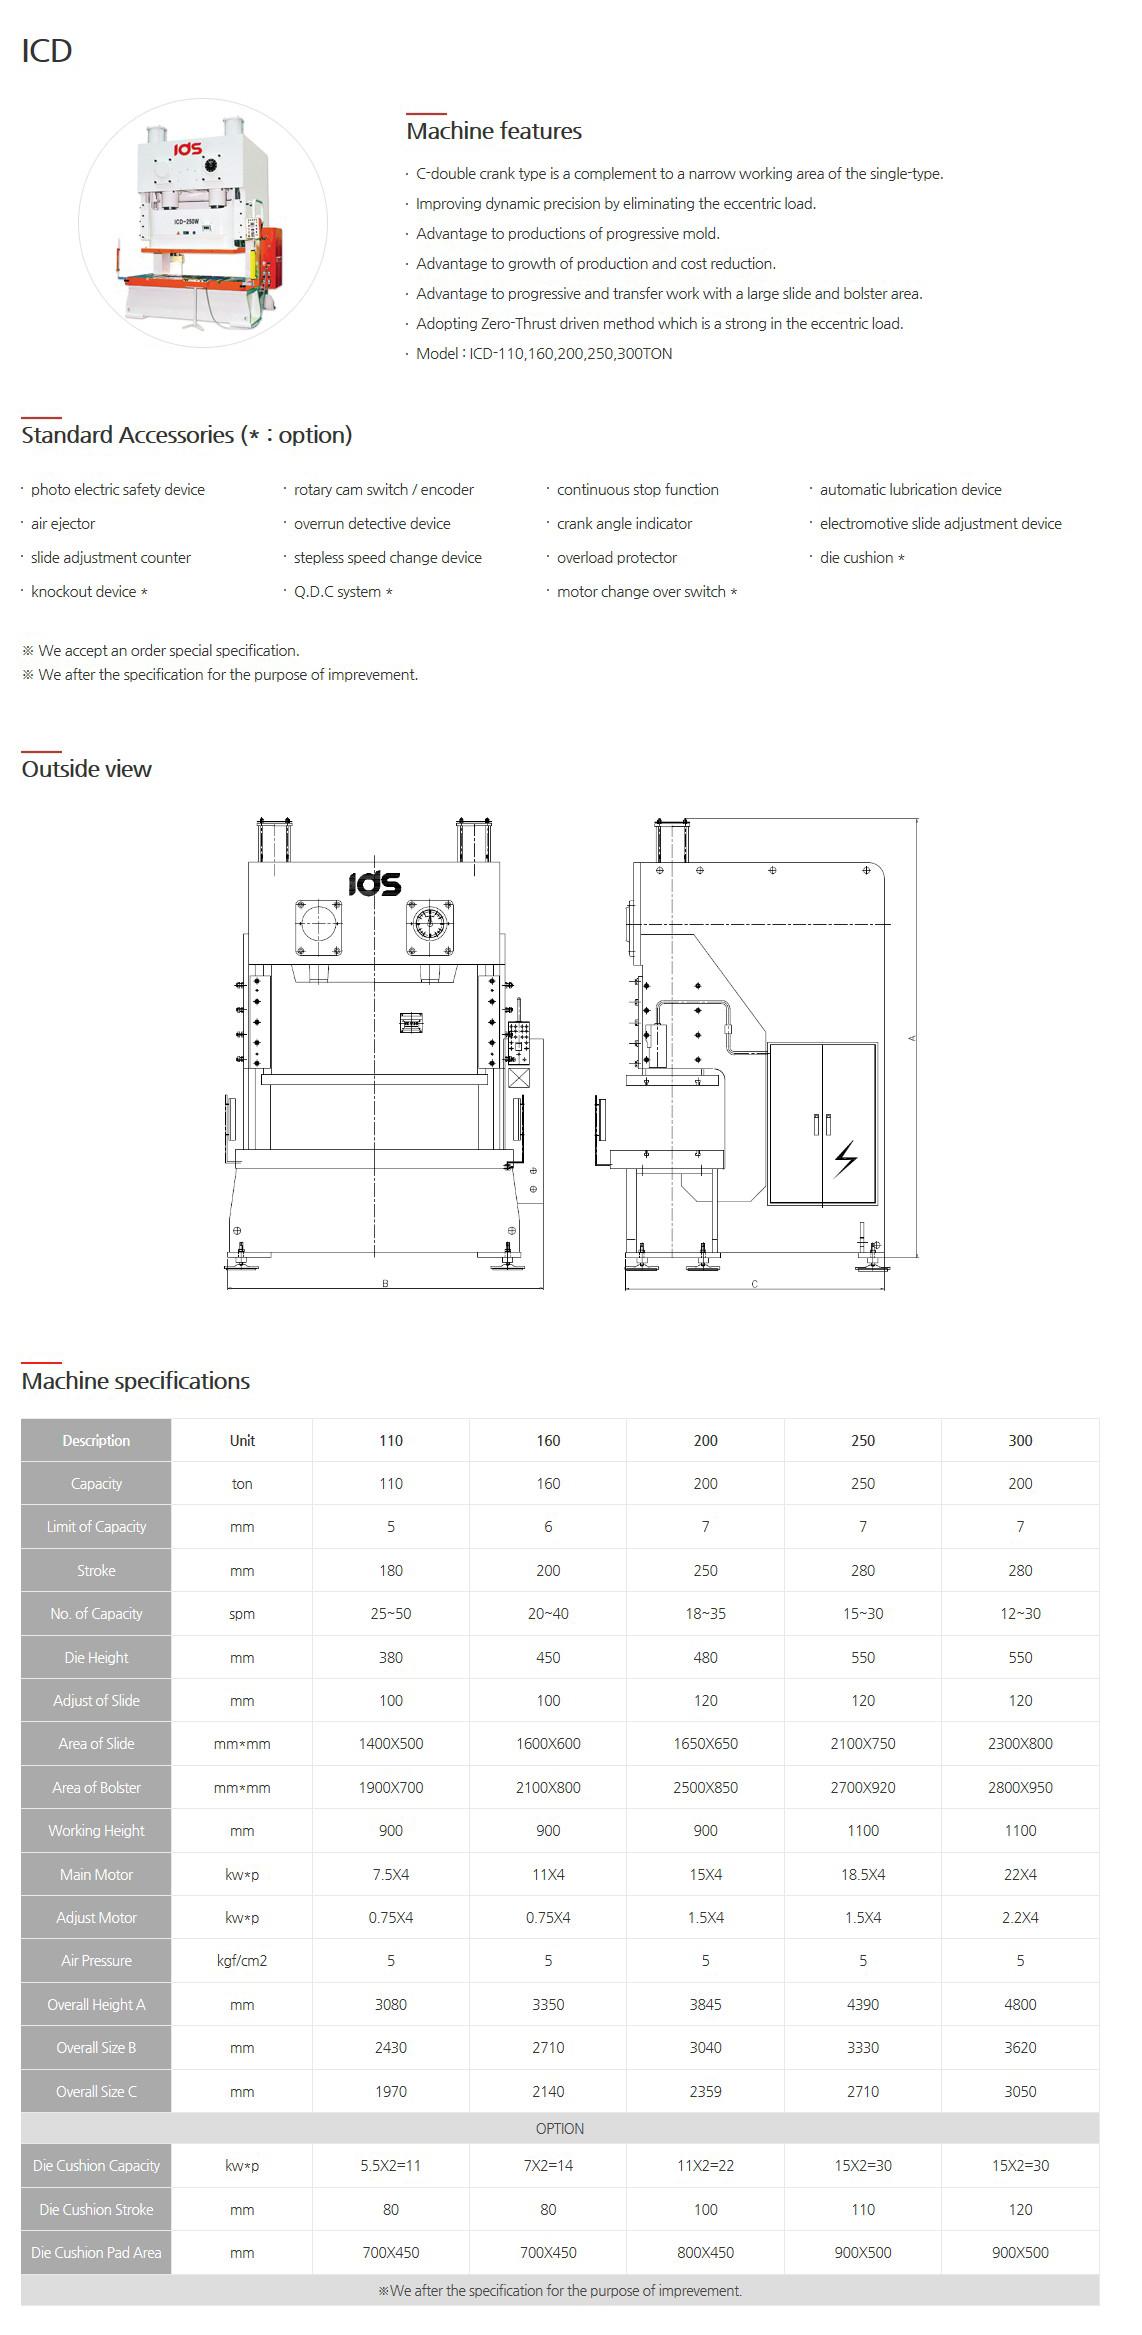 IDS PRESS Mechanical Presses (C-Type Press) ICD